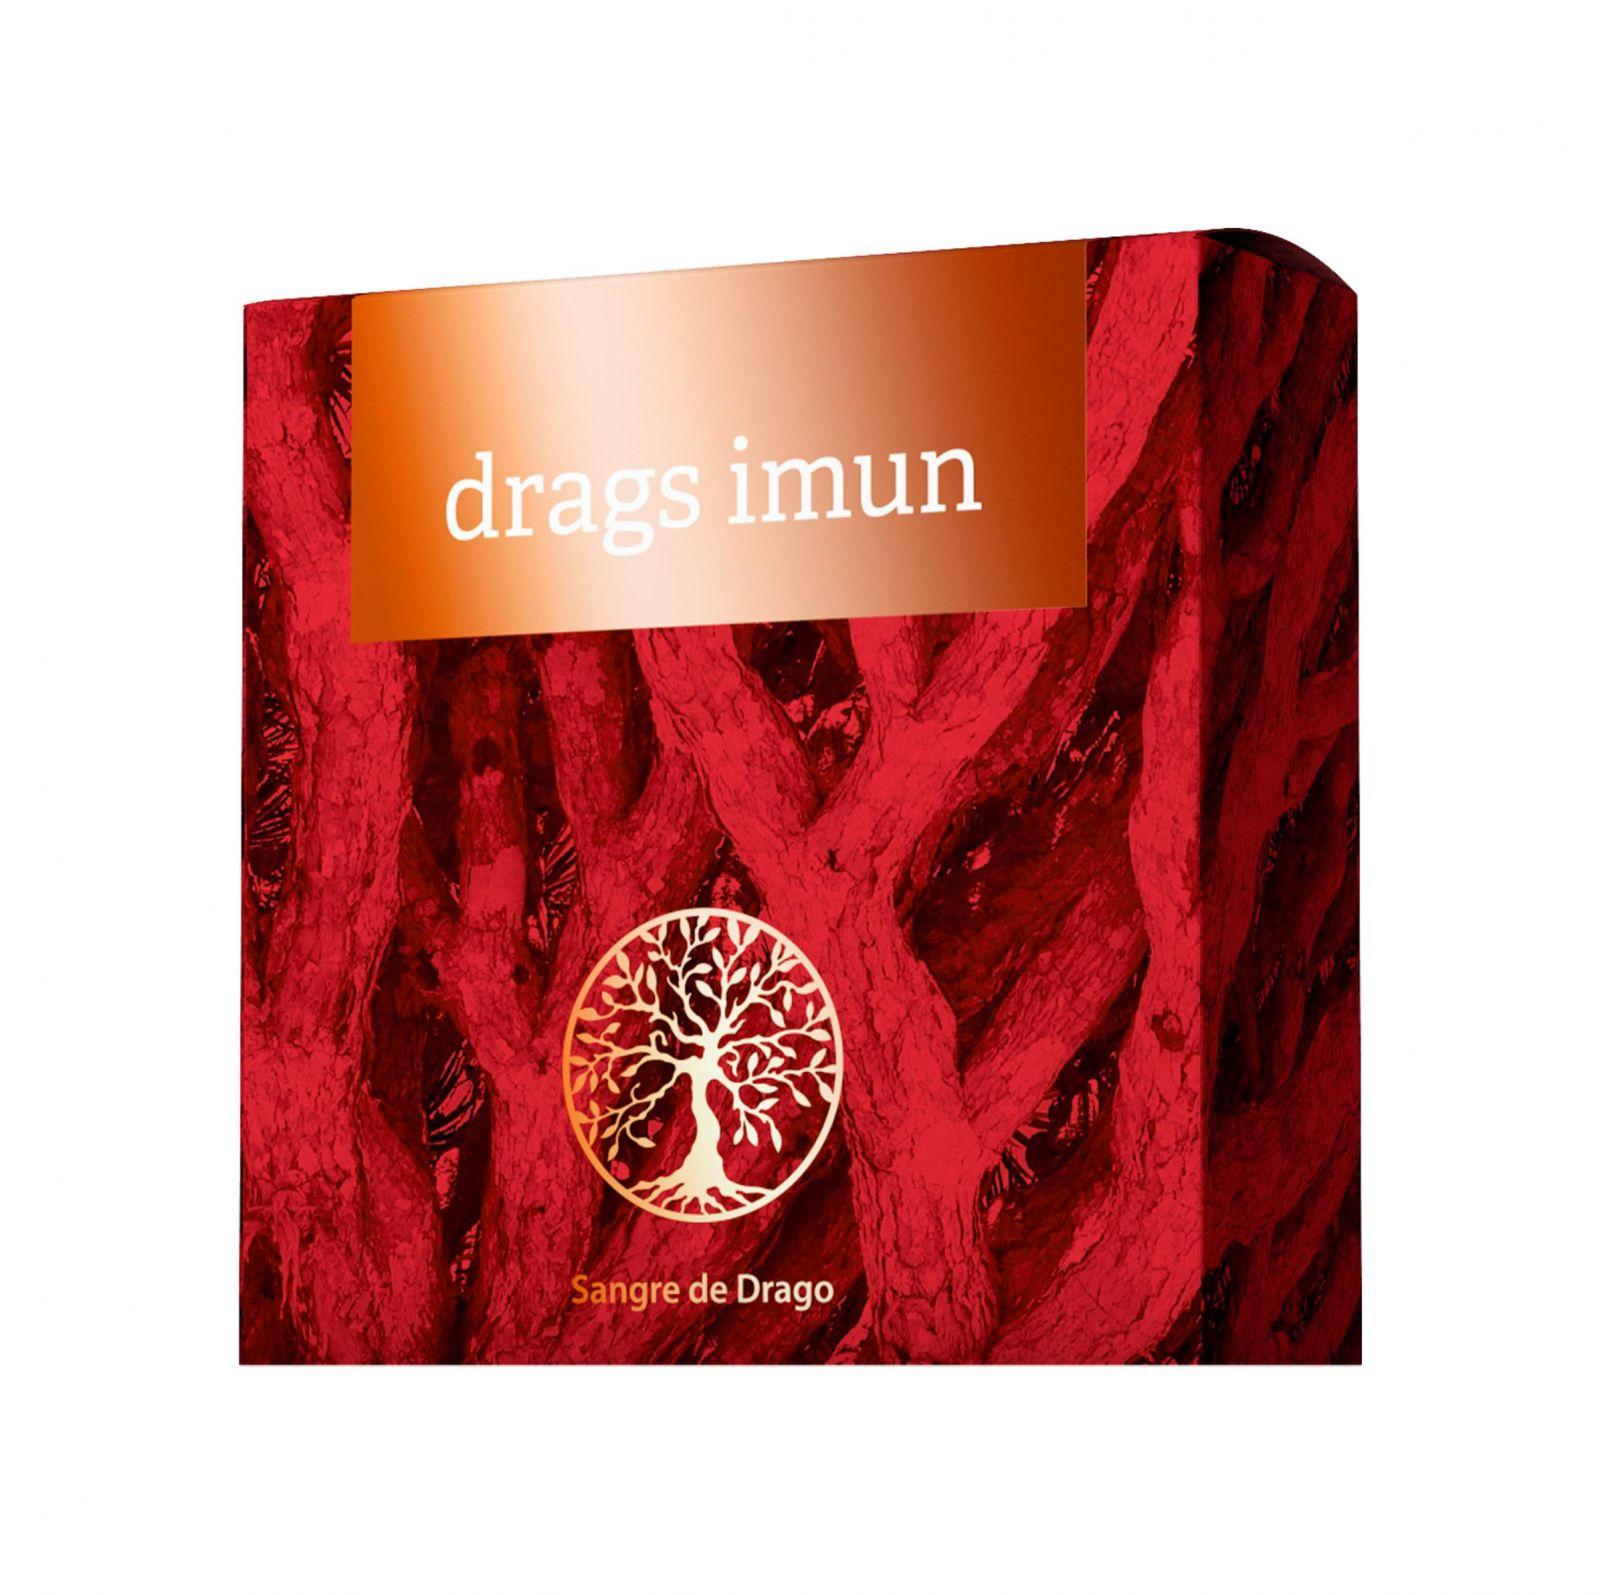 Energy Drags Imun mýdlo 100 g